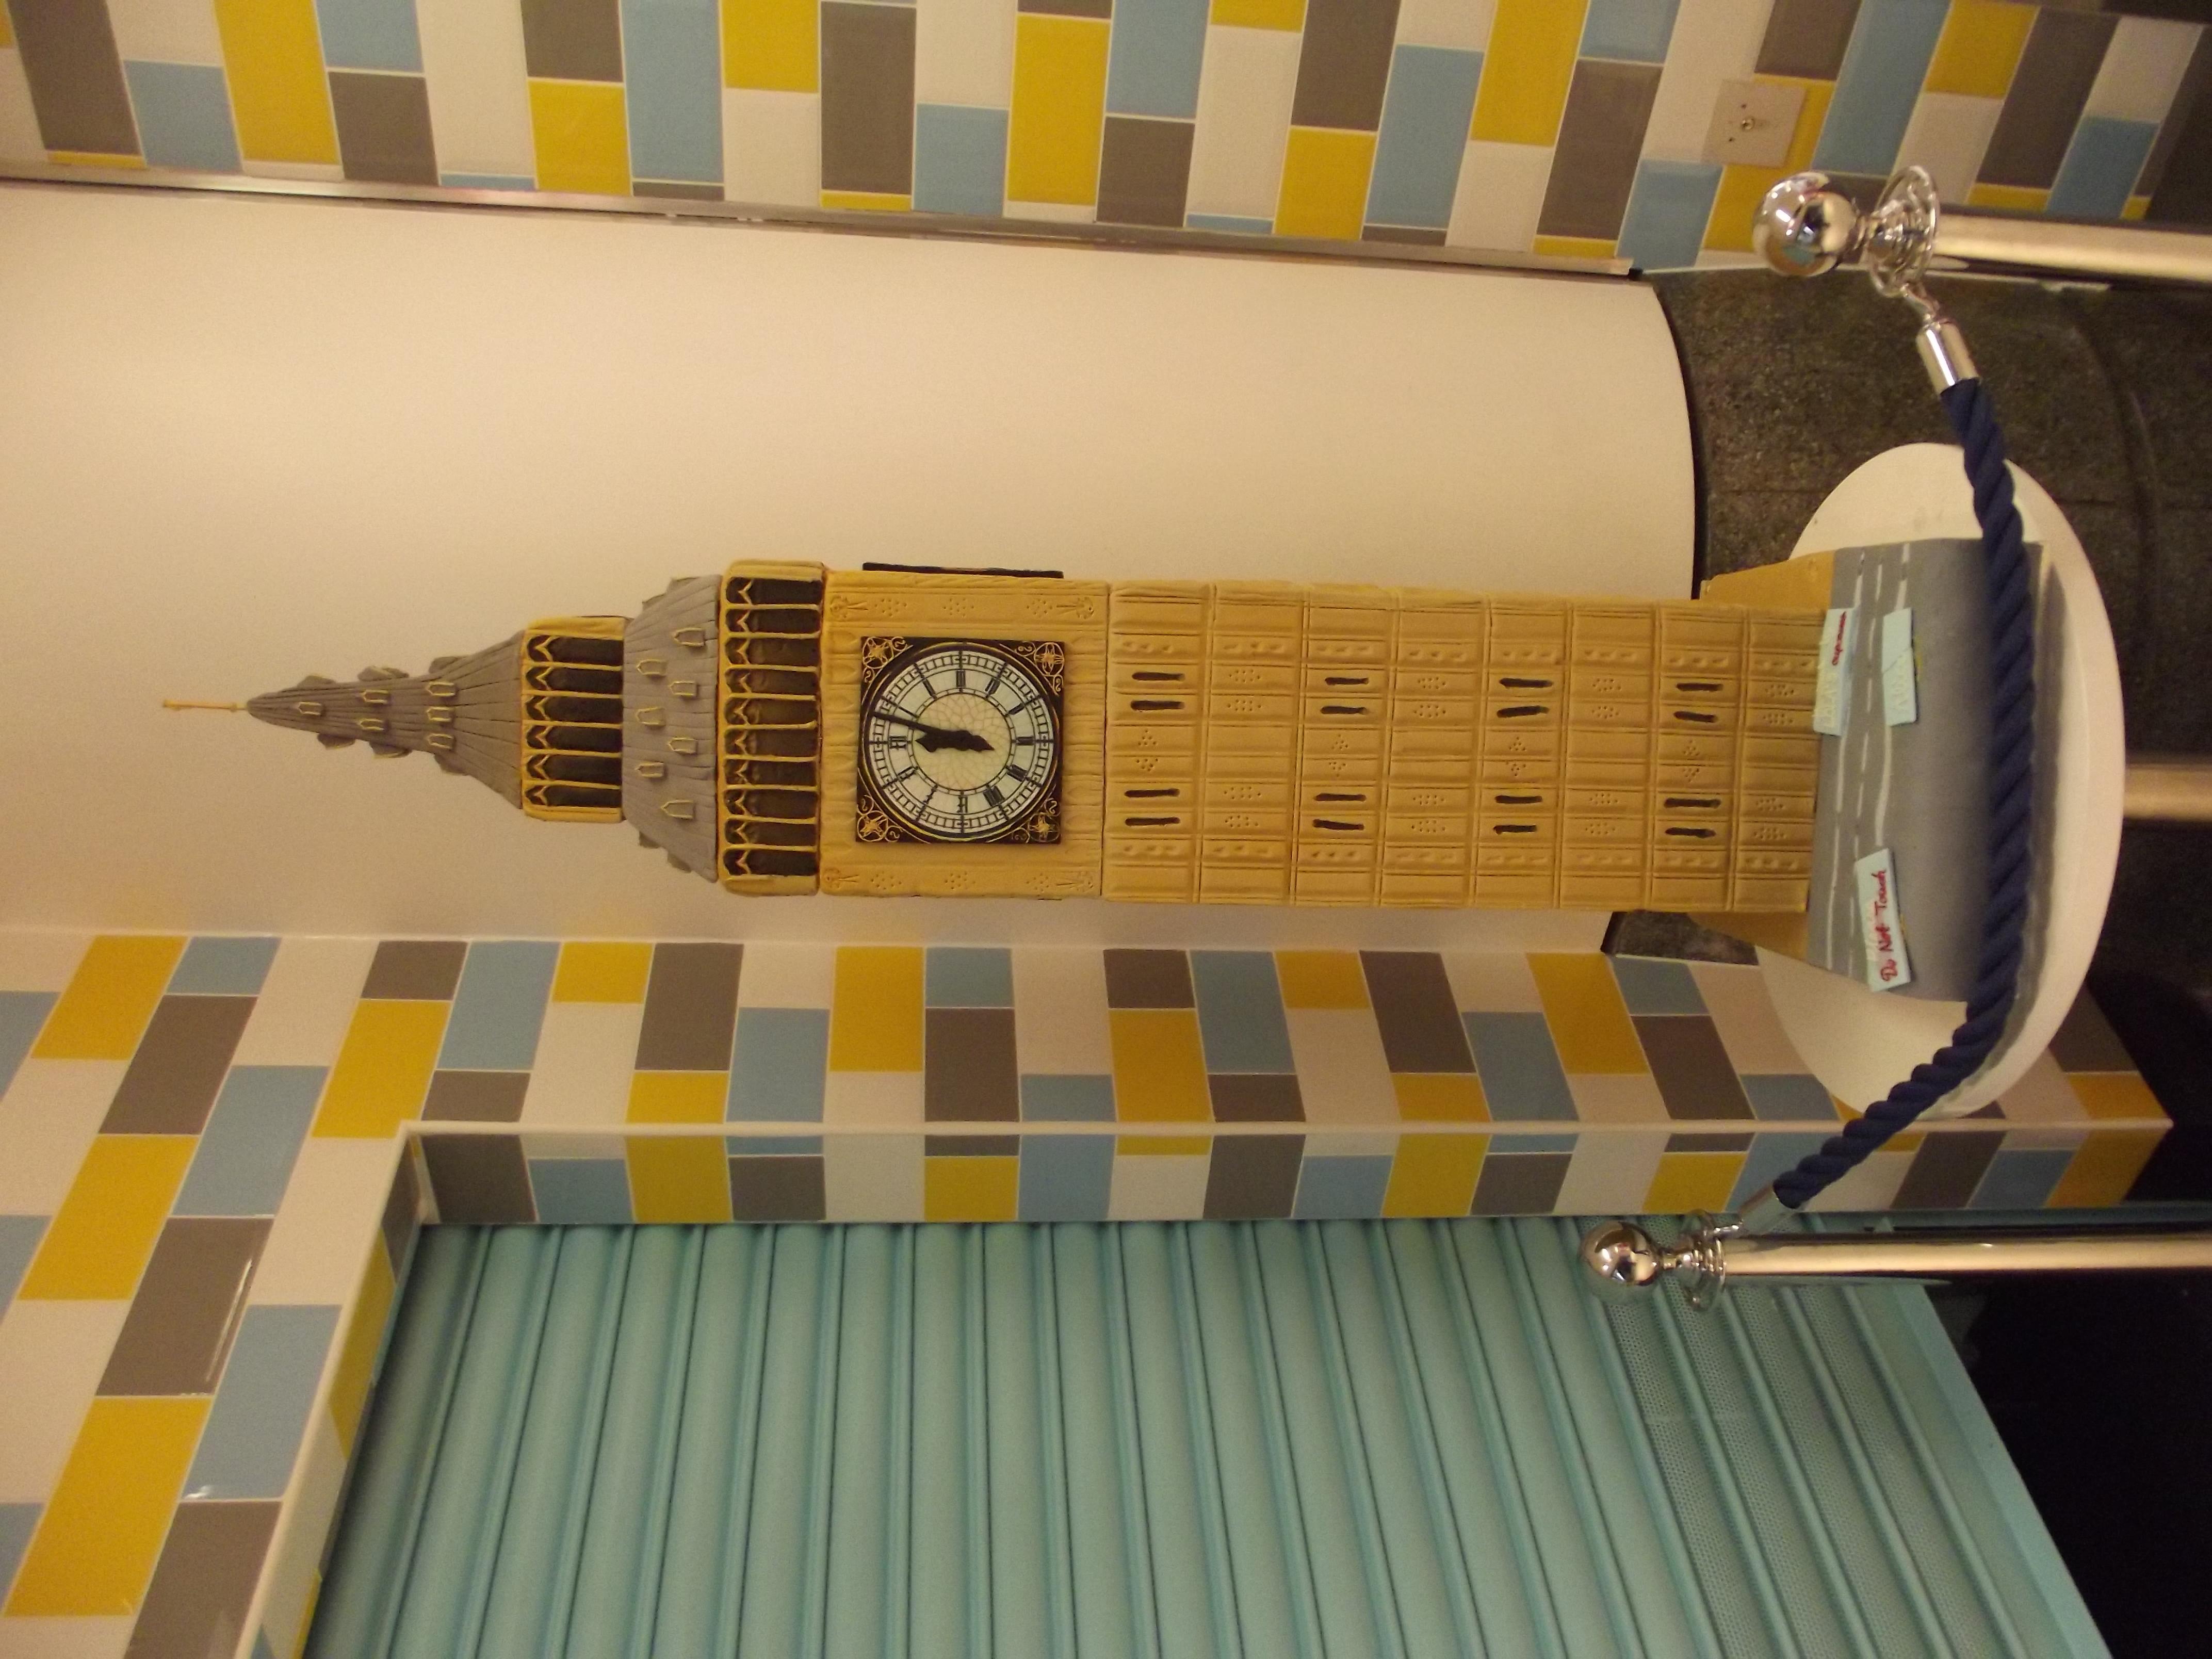 Big Ben - cake - Victoria Place Flickr - Photo Sharing!